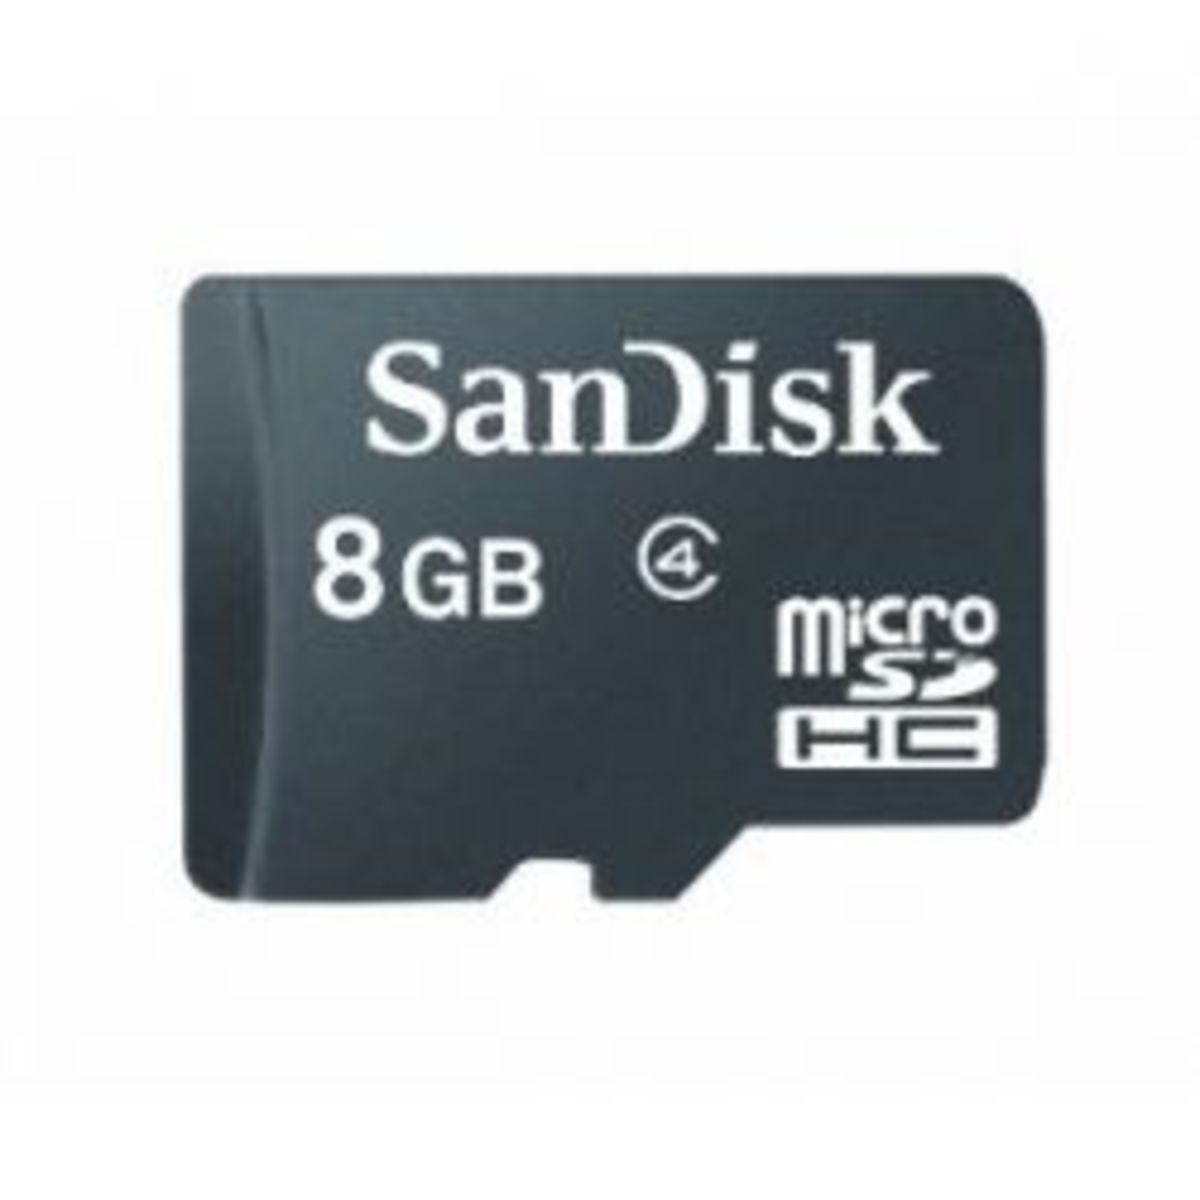 8GB Sandisk MicroSDHC Memory Card